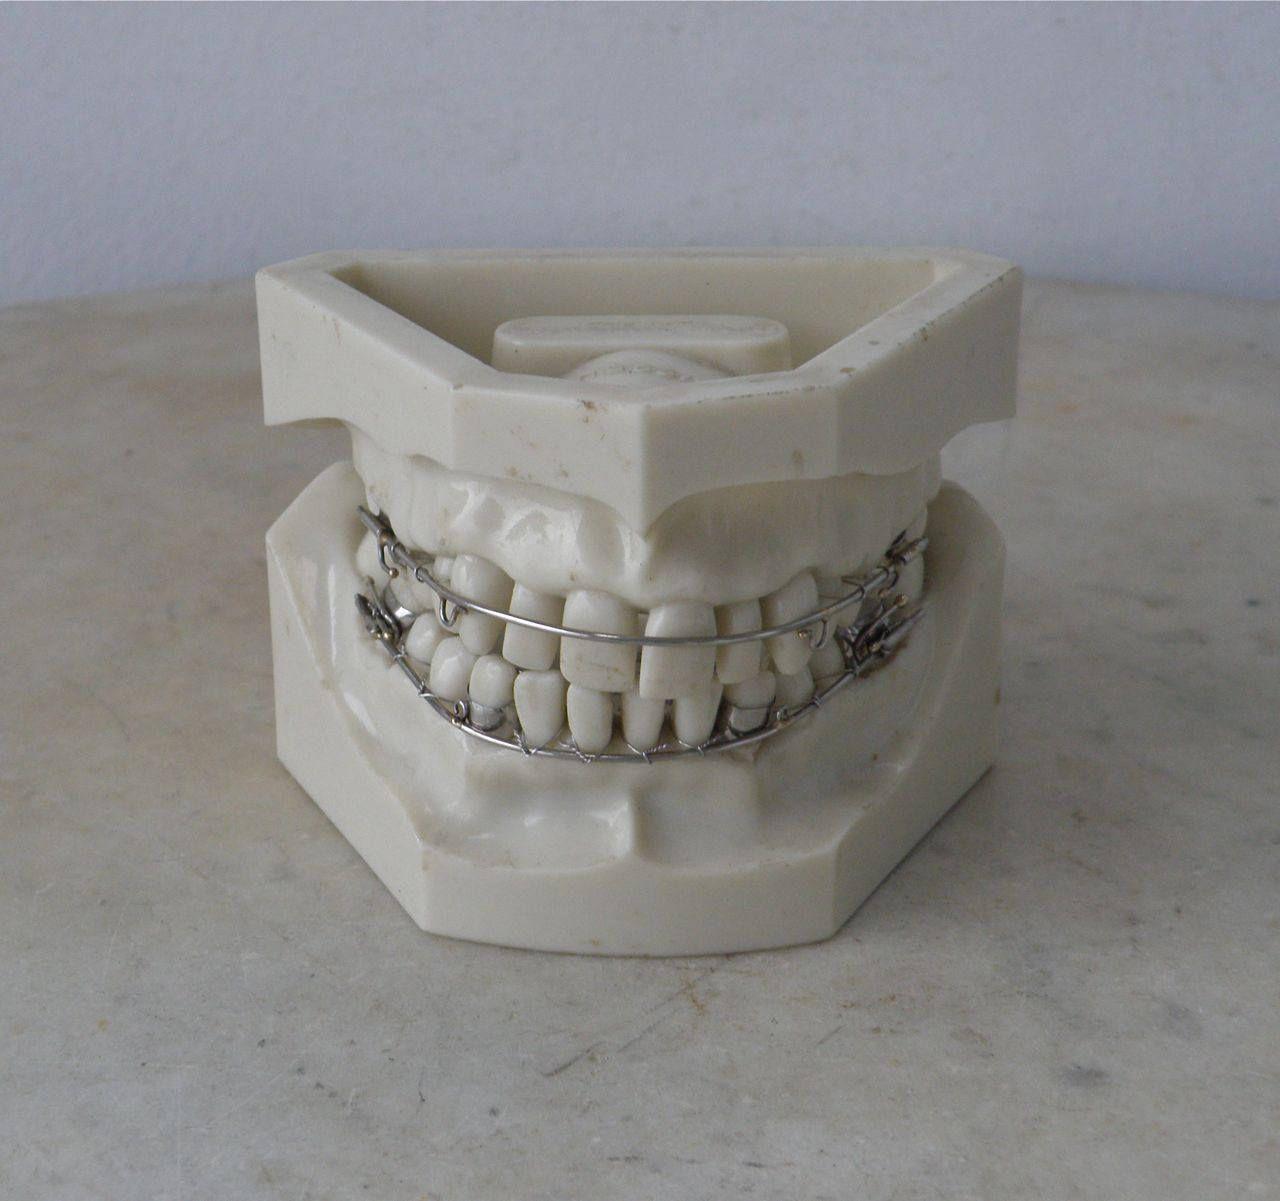 MOLD of TEETH Orthodontia Orthodontics Bite Correction Dental Mold